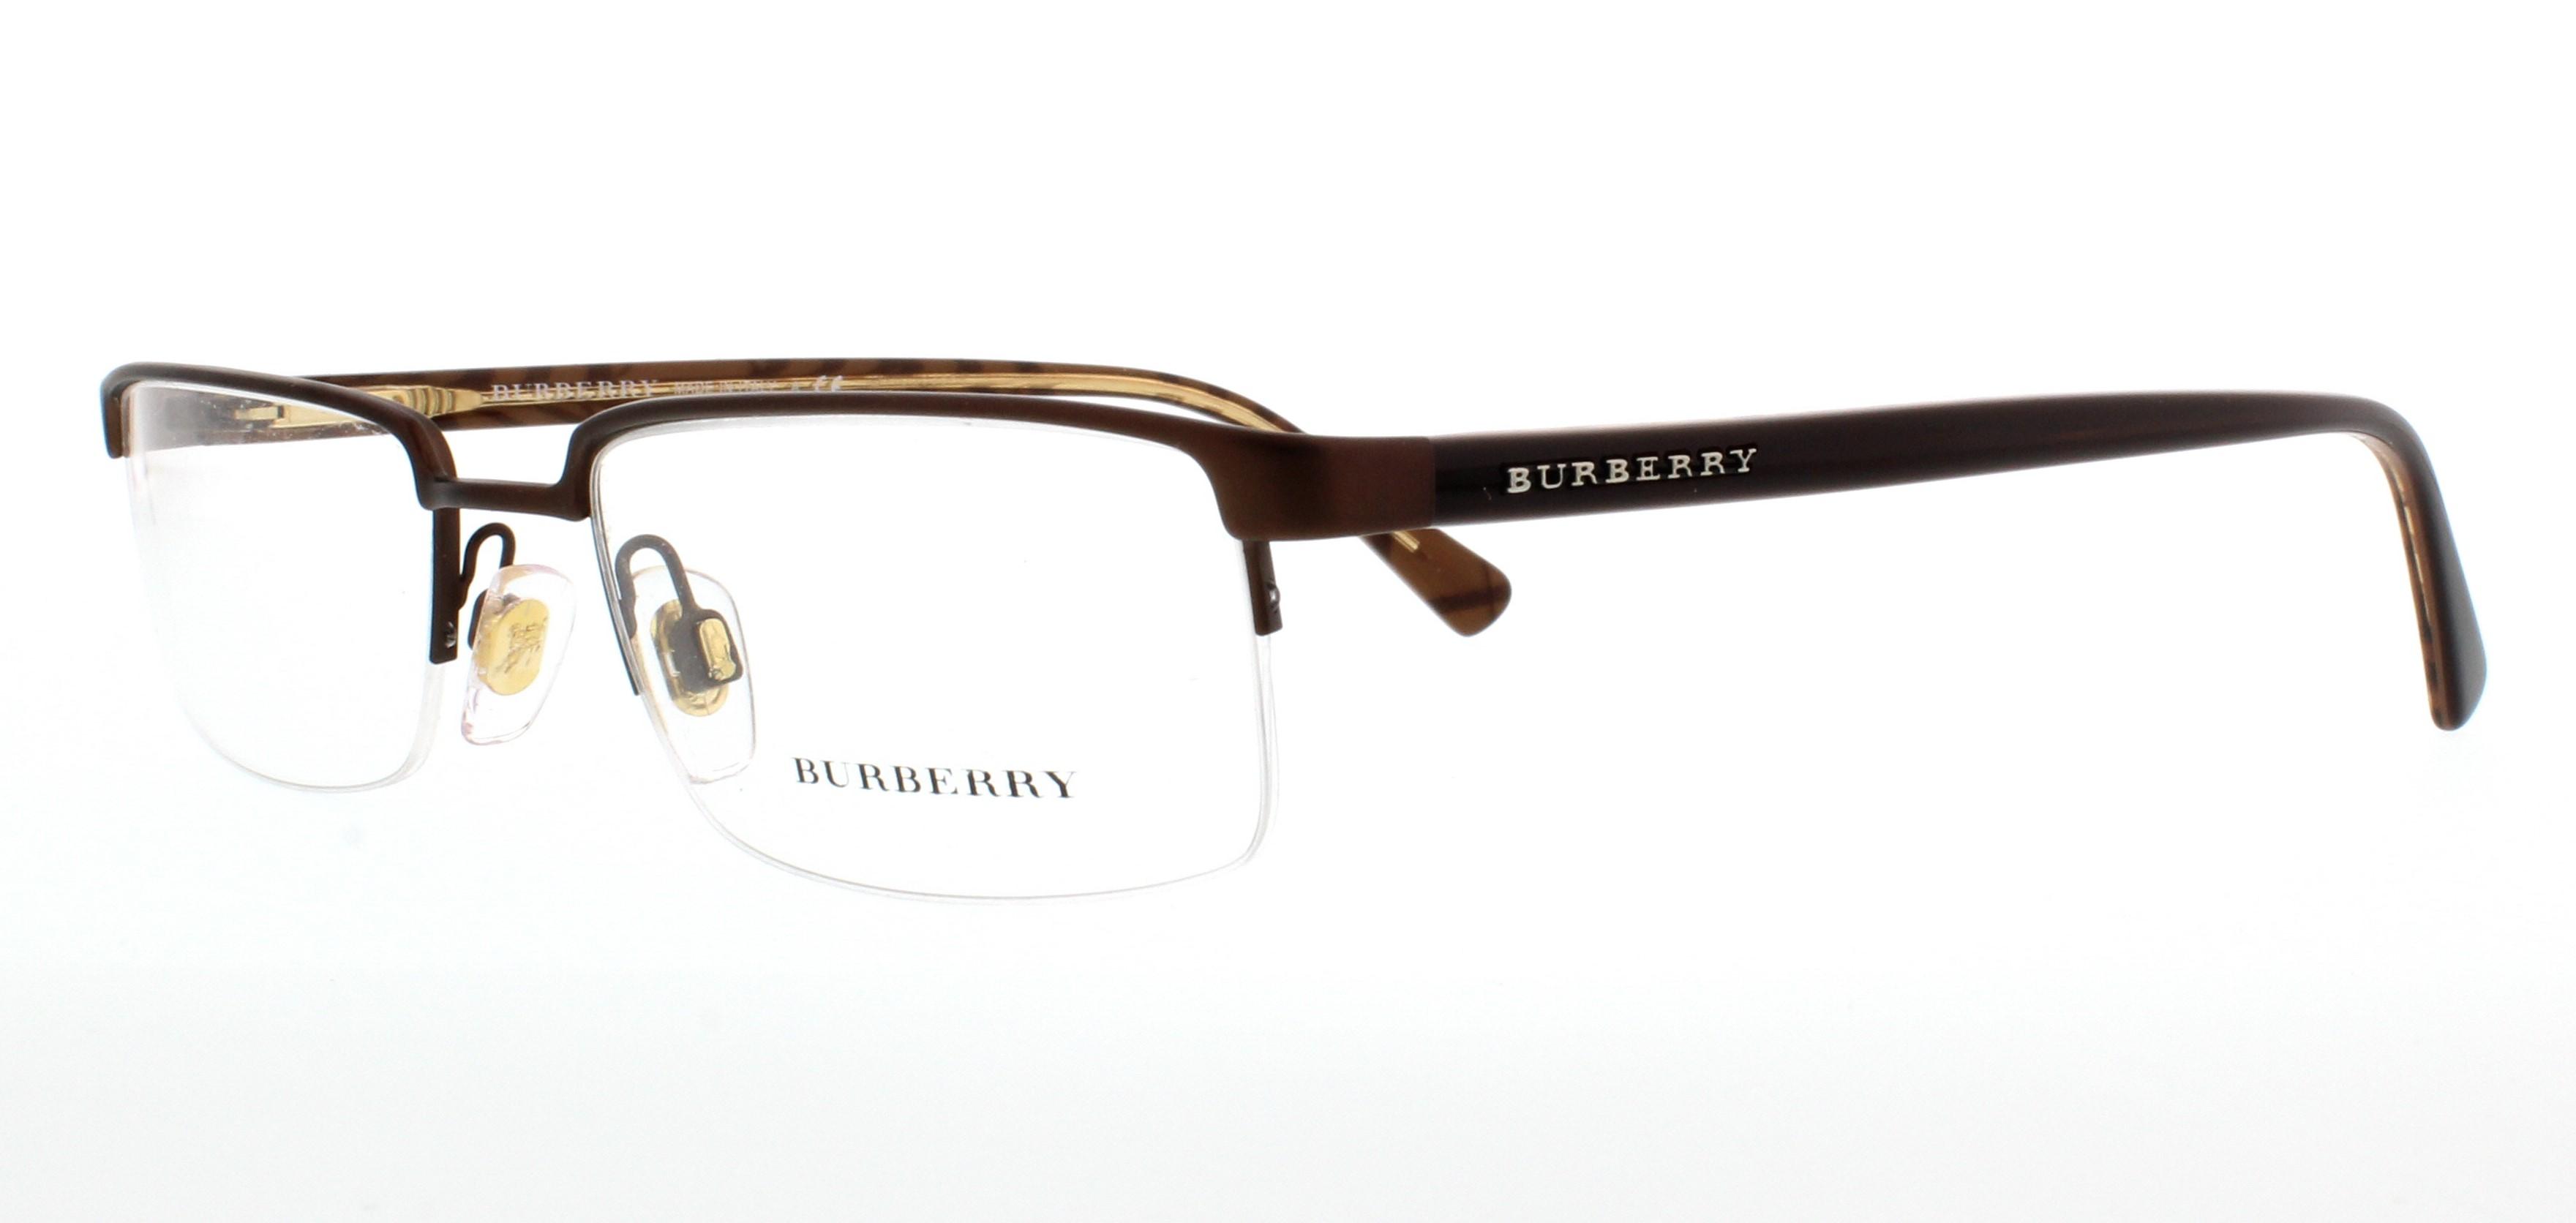 789aa6d1cb92 Custom Size Eyeglass Frames